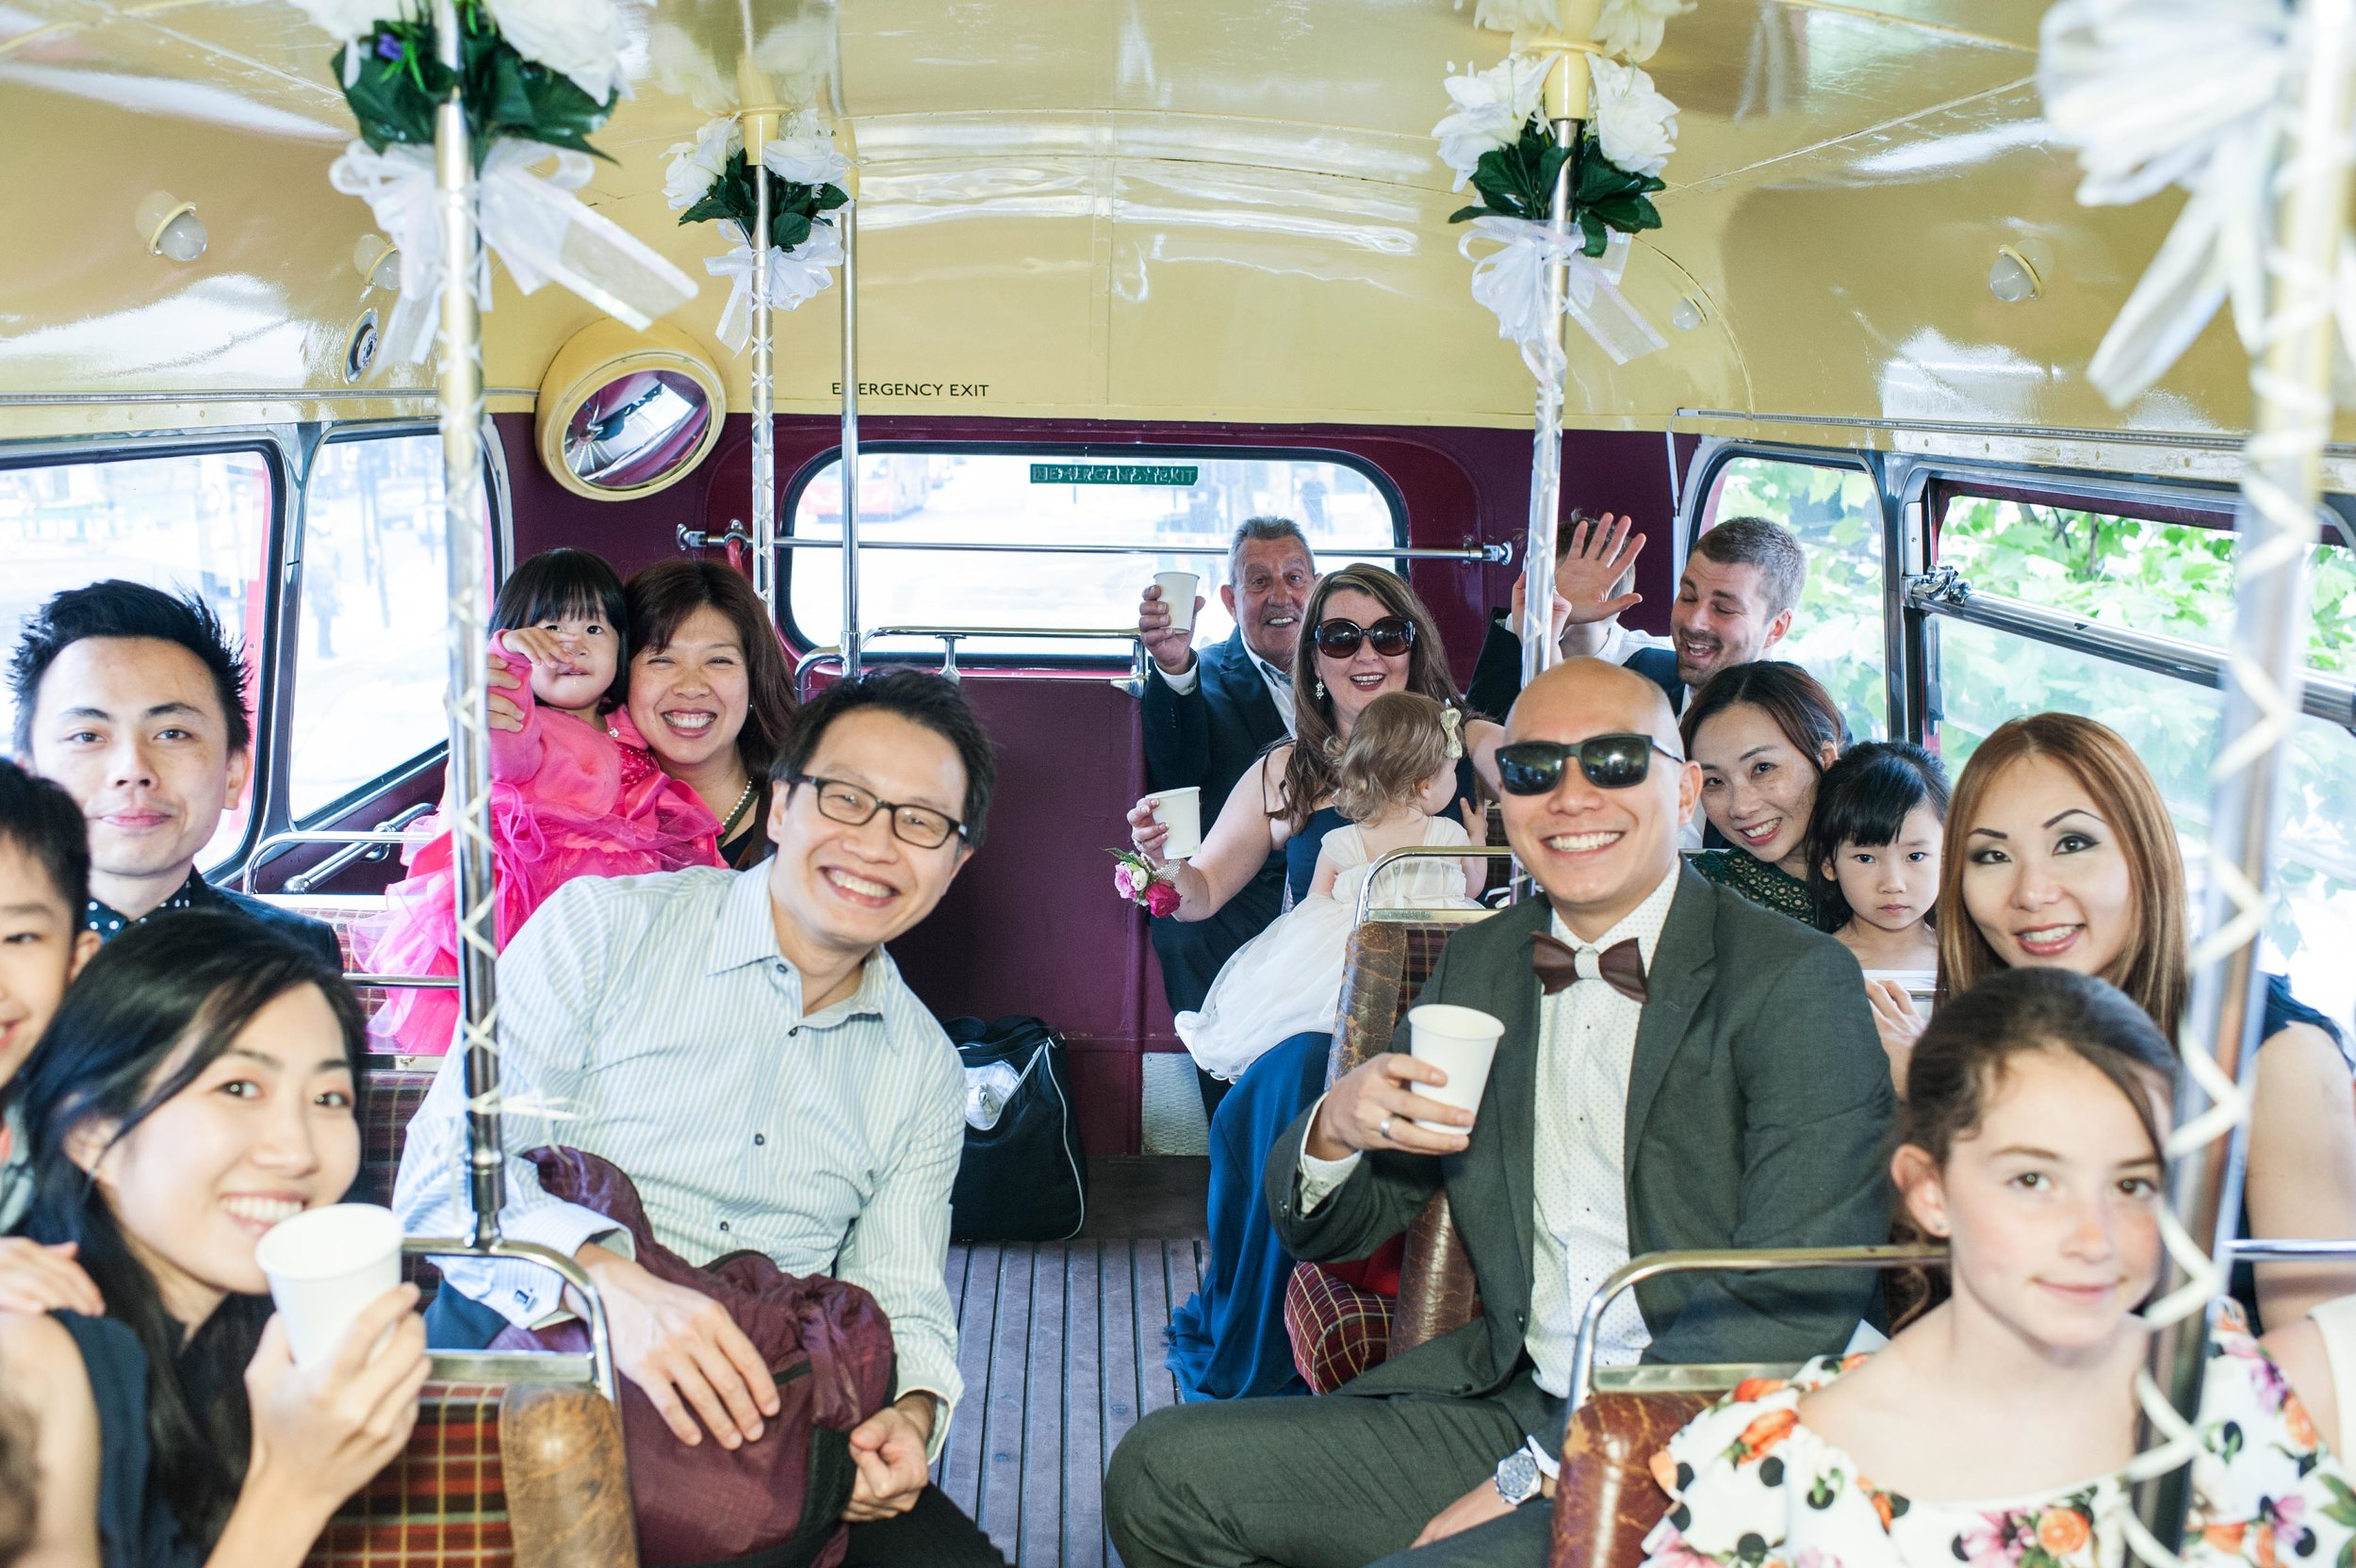 D&M_Marylebone Town Hall Wedding (170 of 239).jpg